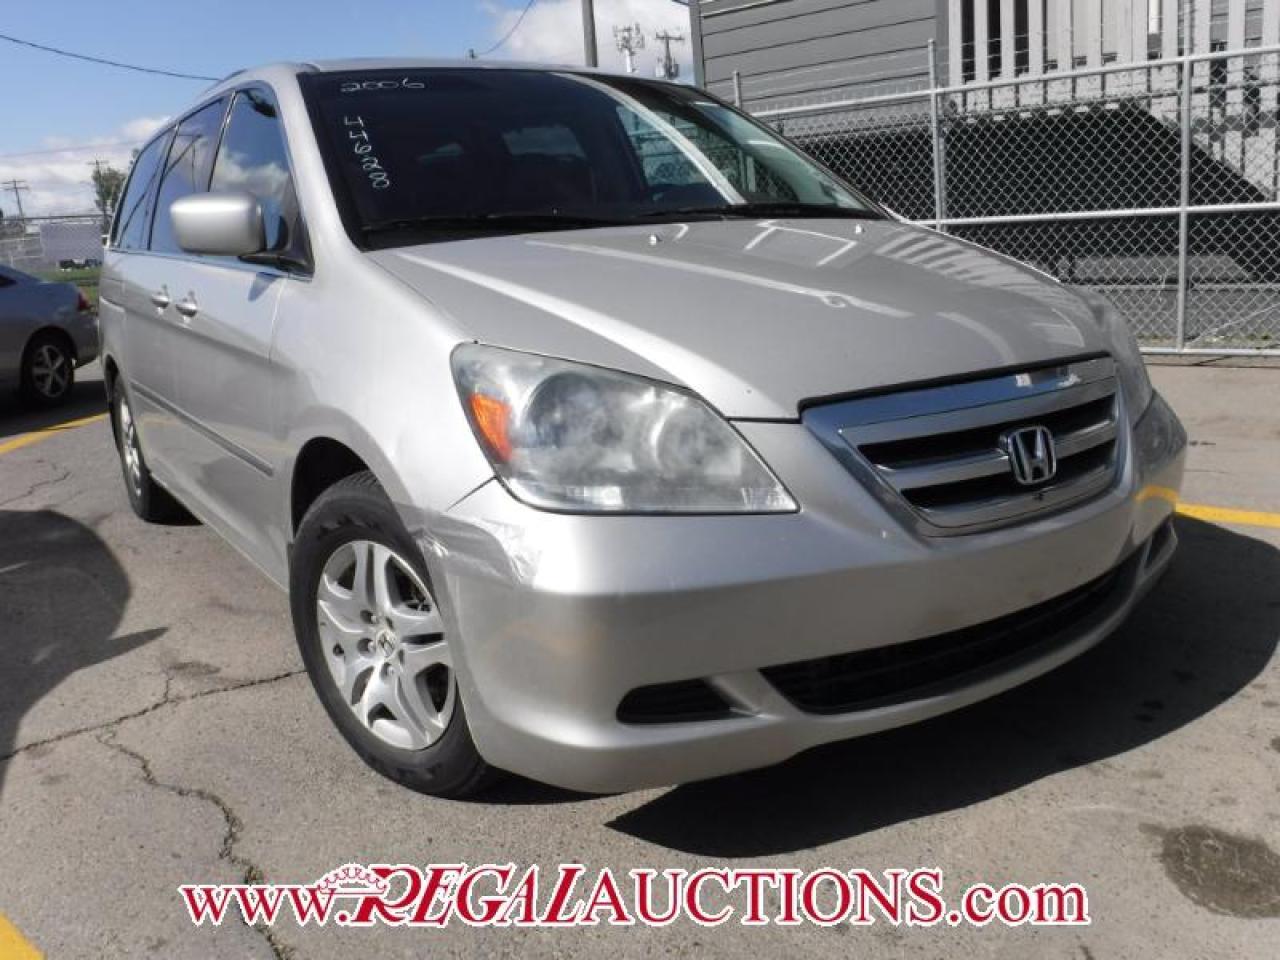 Photo of Silver 2006 Honda Odyssey